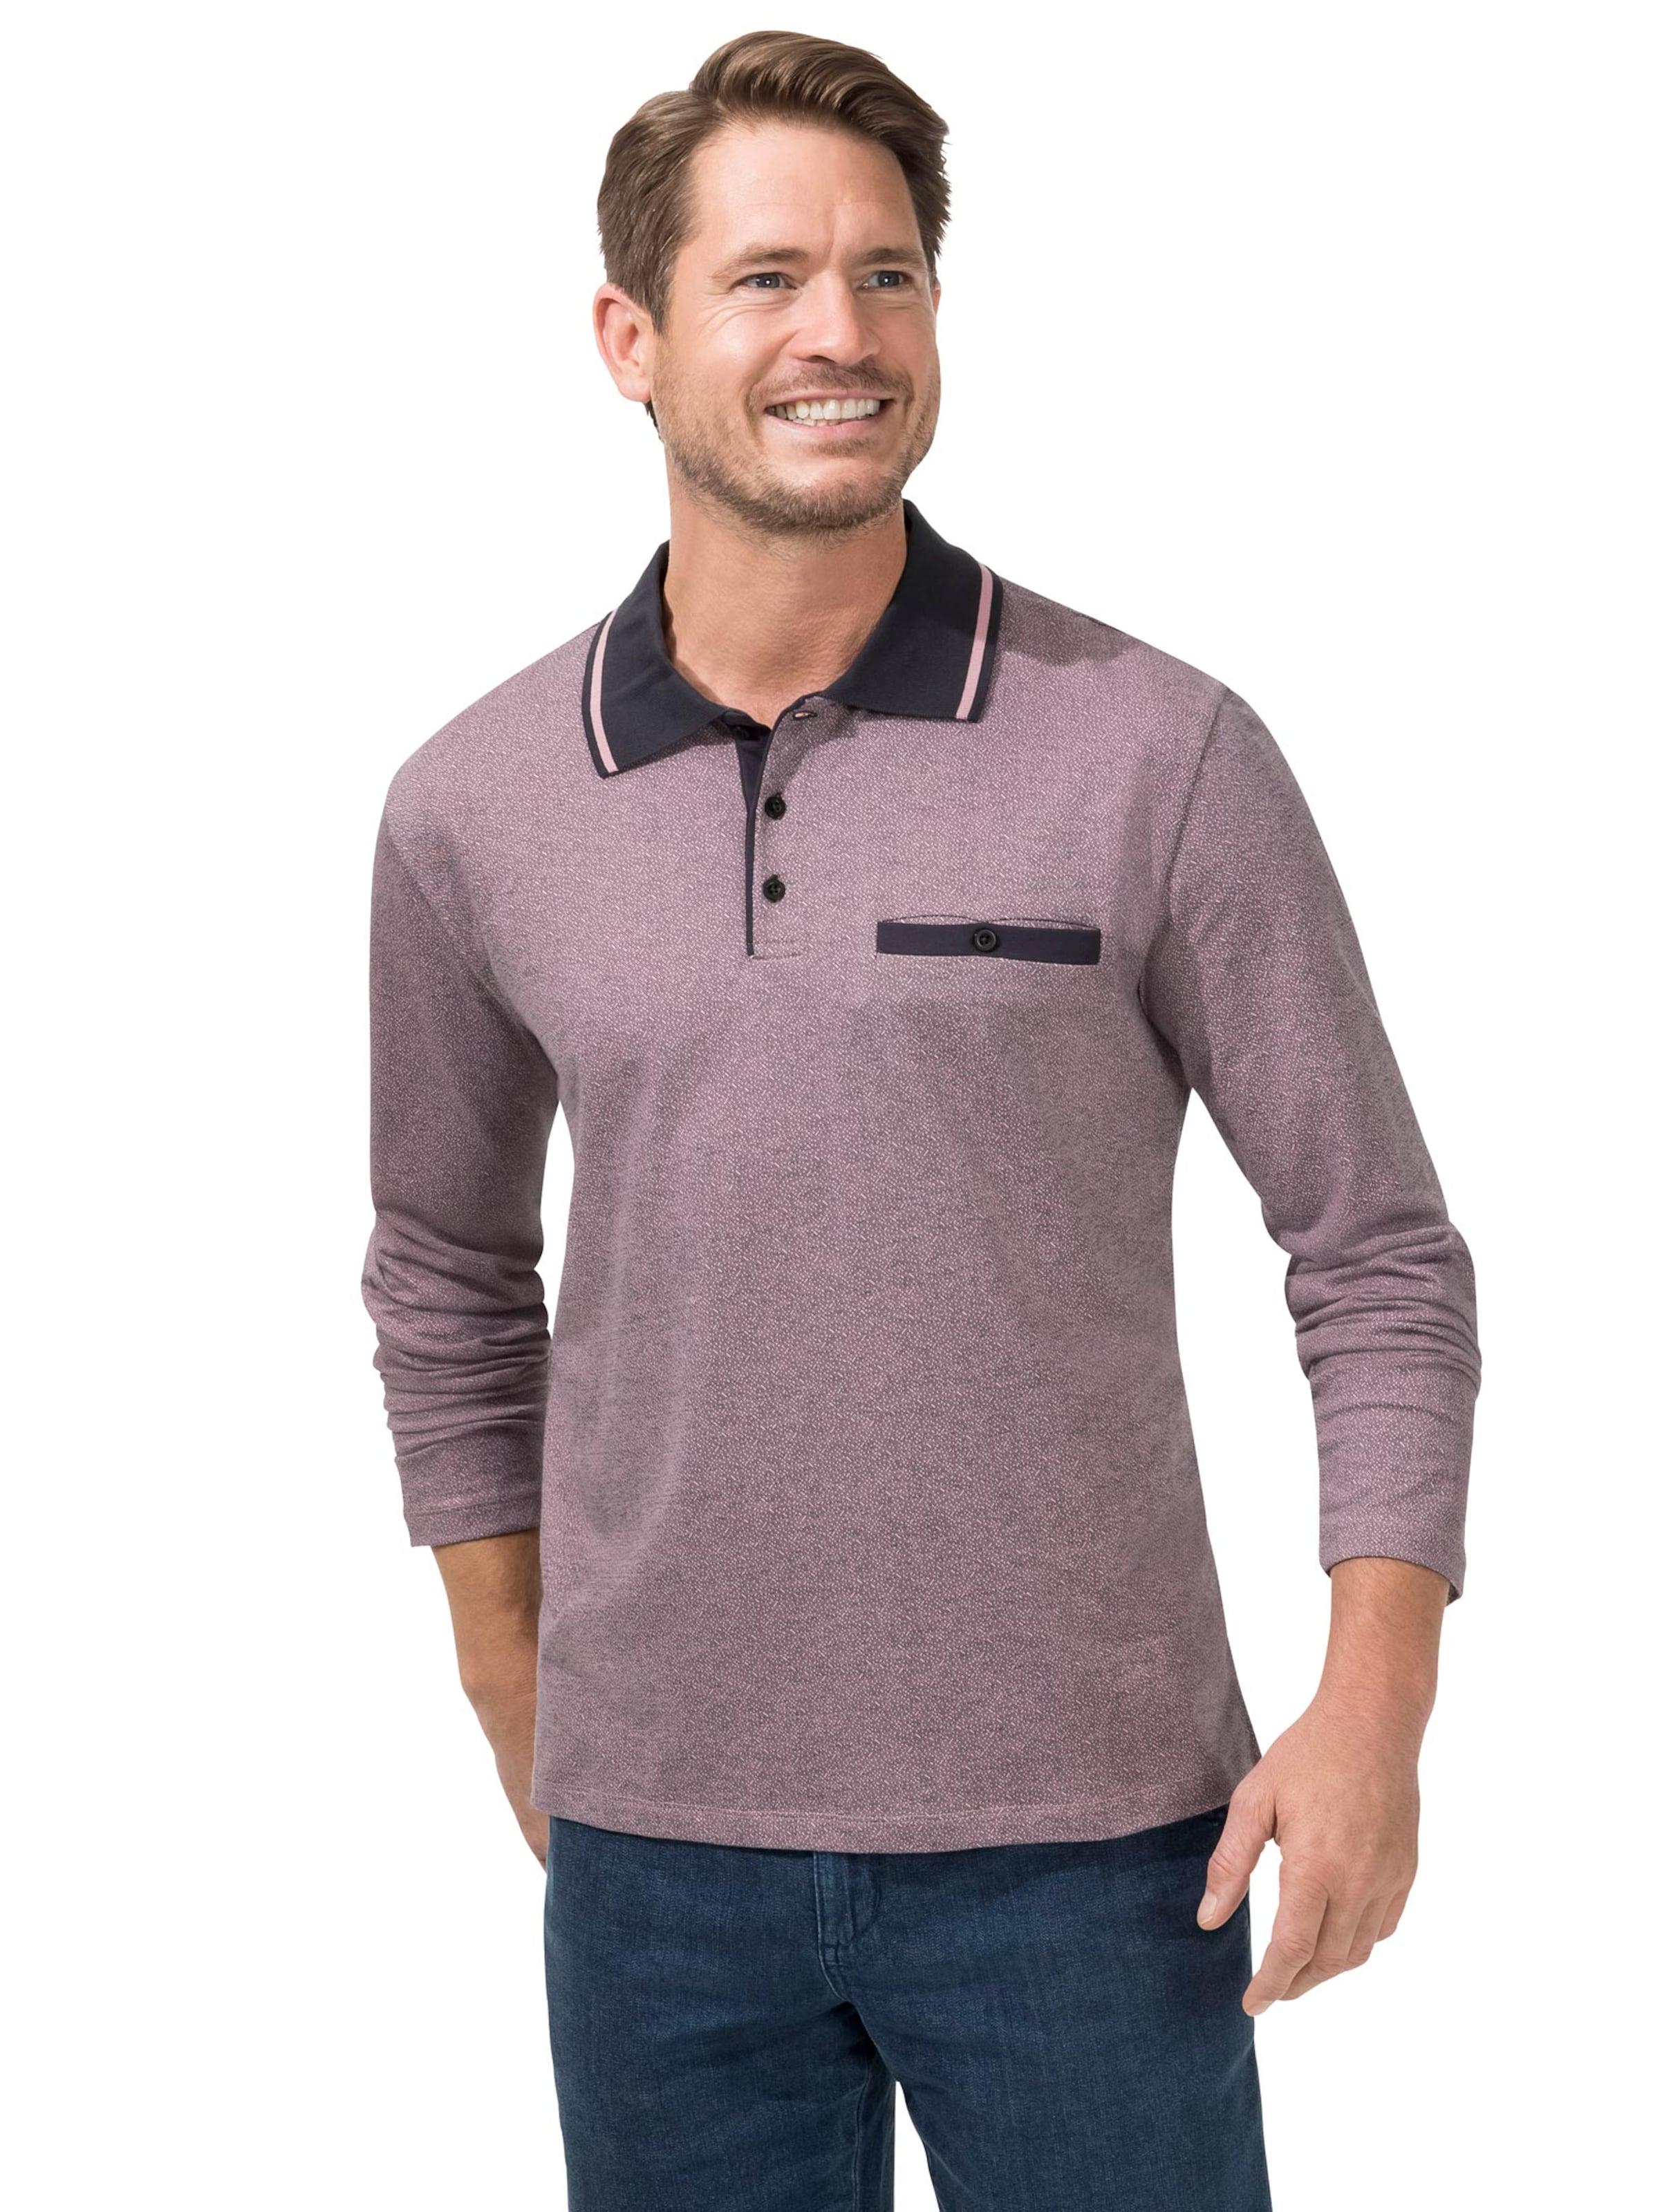 witt weiden - Herren Langarm-Shirt aubergine